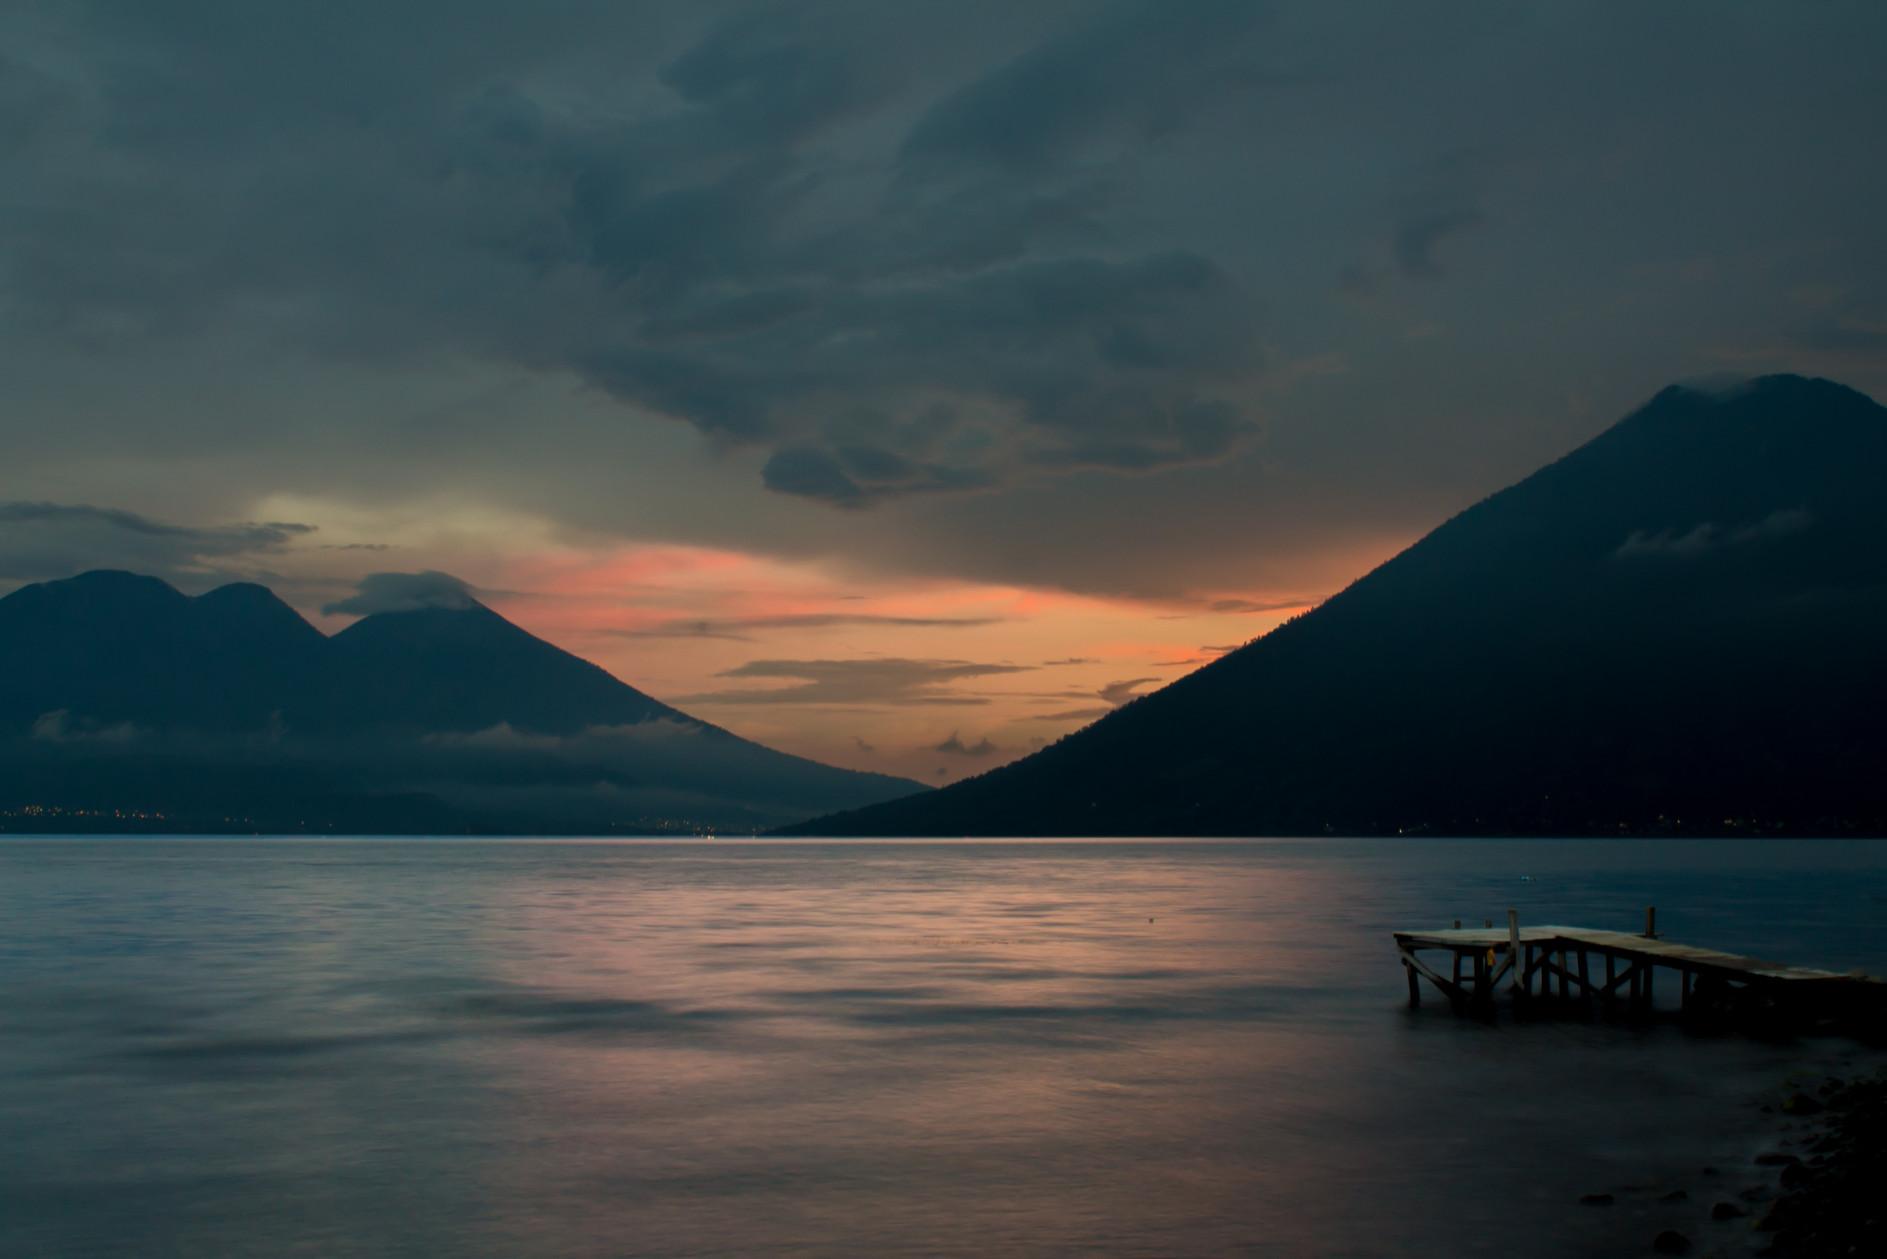 Tzununa, Bambu Guest House, Retreat Center, Small groups, grout travel, activities, Tzununa, Lake Atitlan, Guatemala, sustainable, retreat, retreats, 2019